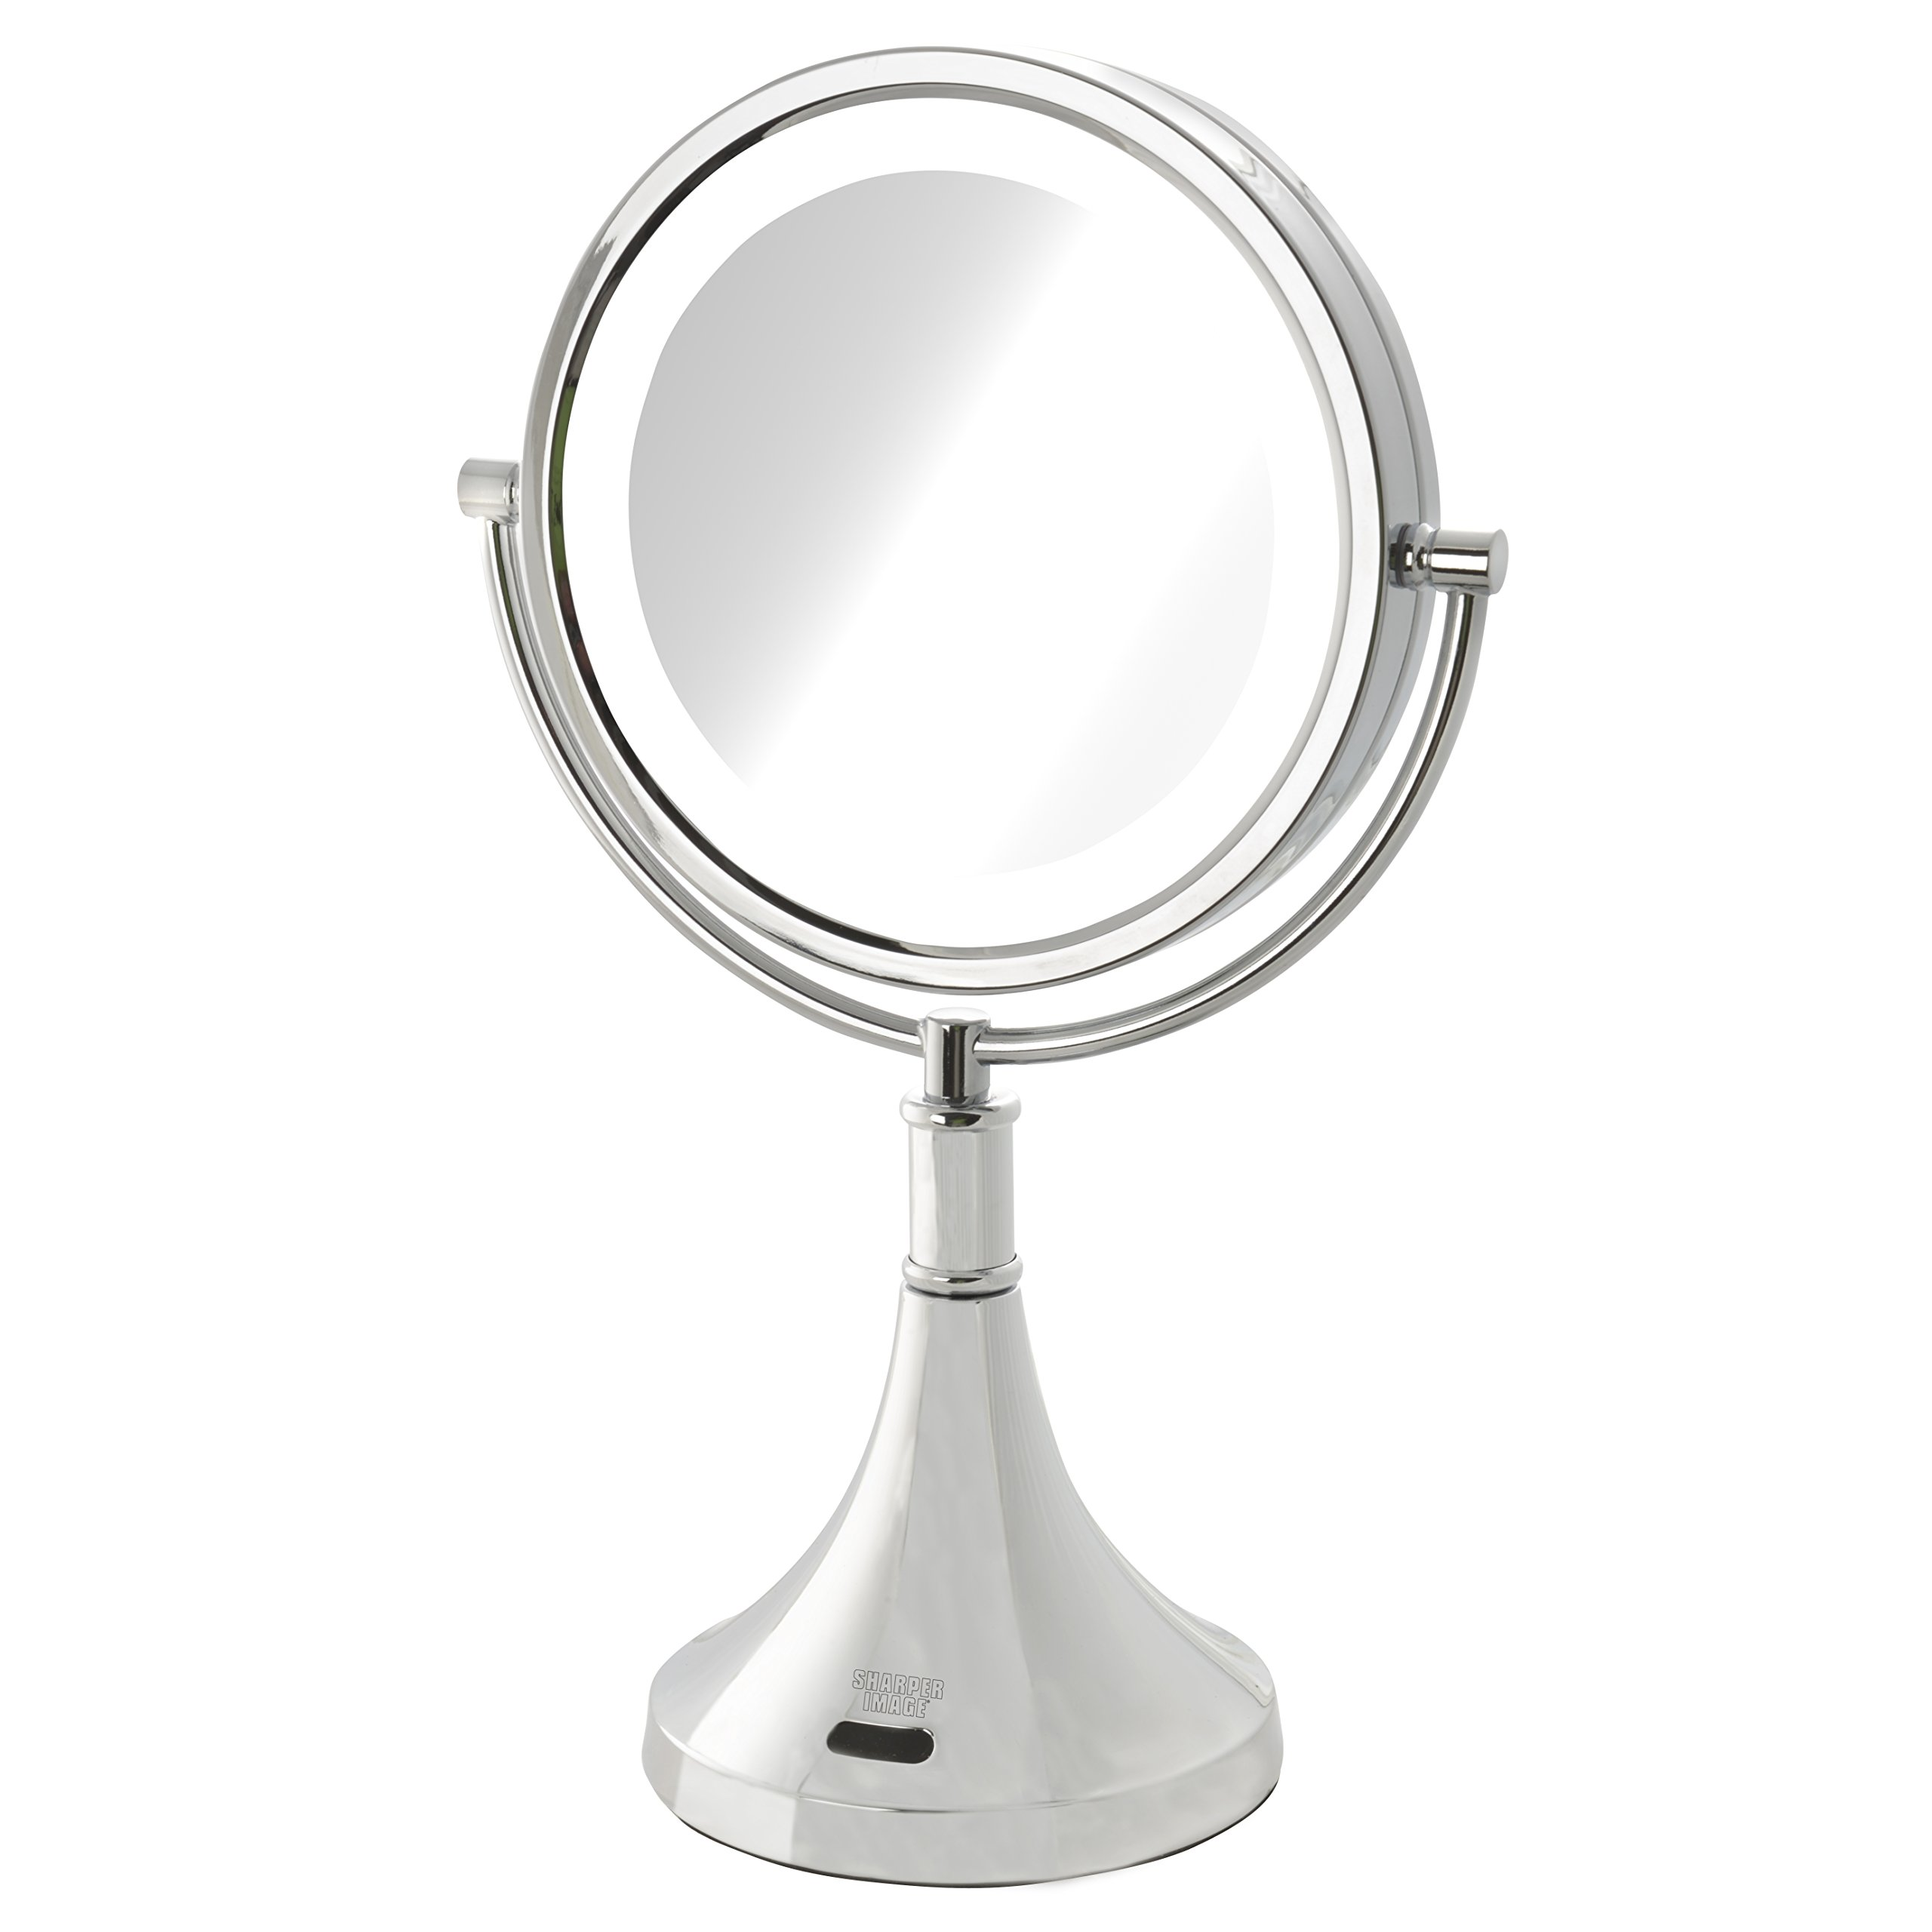 Sharper Image 8X-1X Led Lighted Sensor Mirror, Chrome, 2.95 Pound